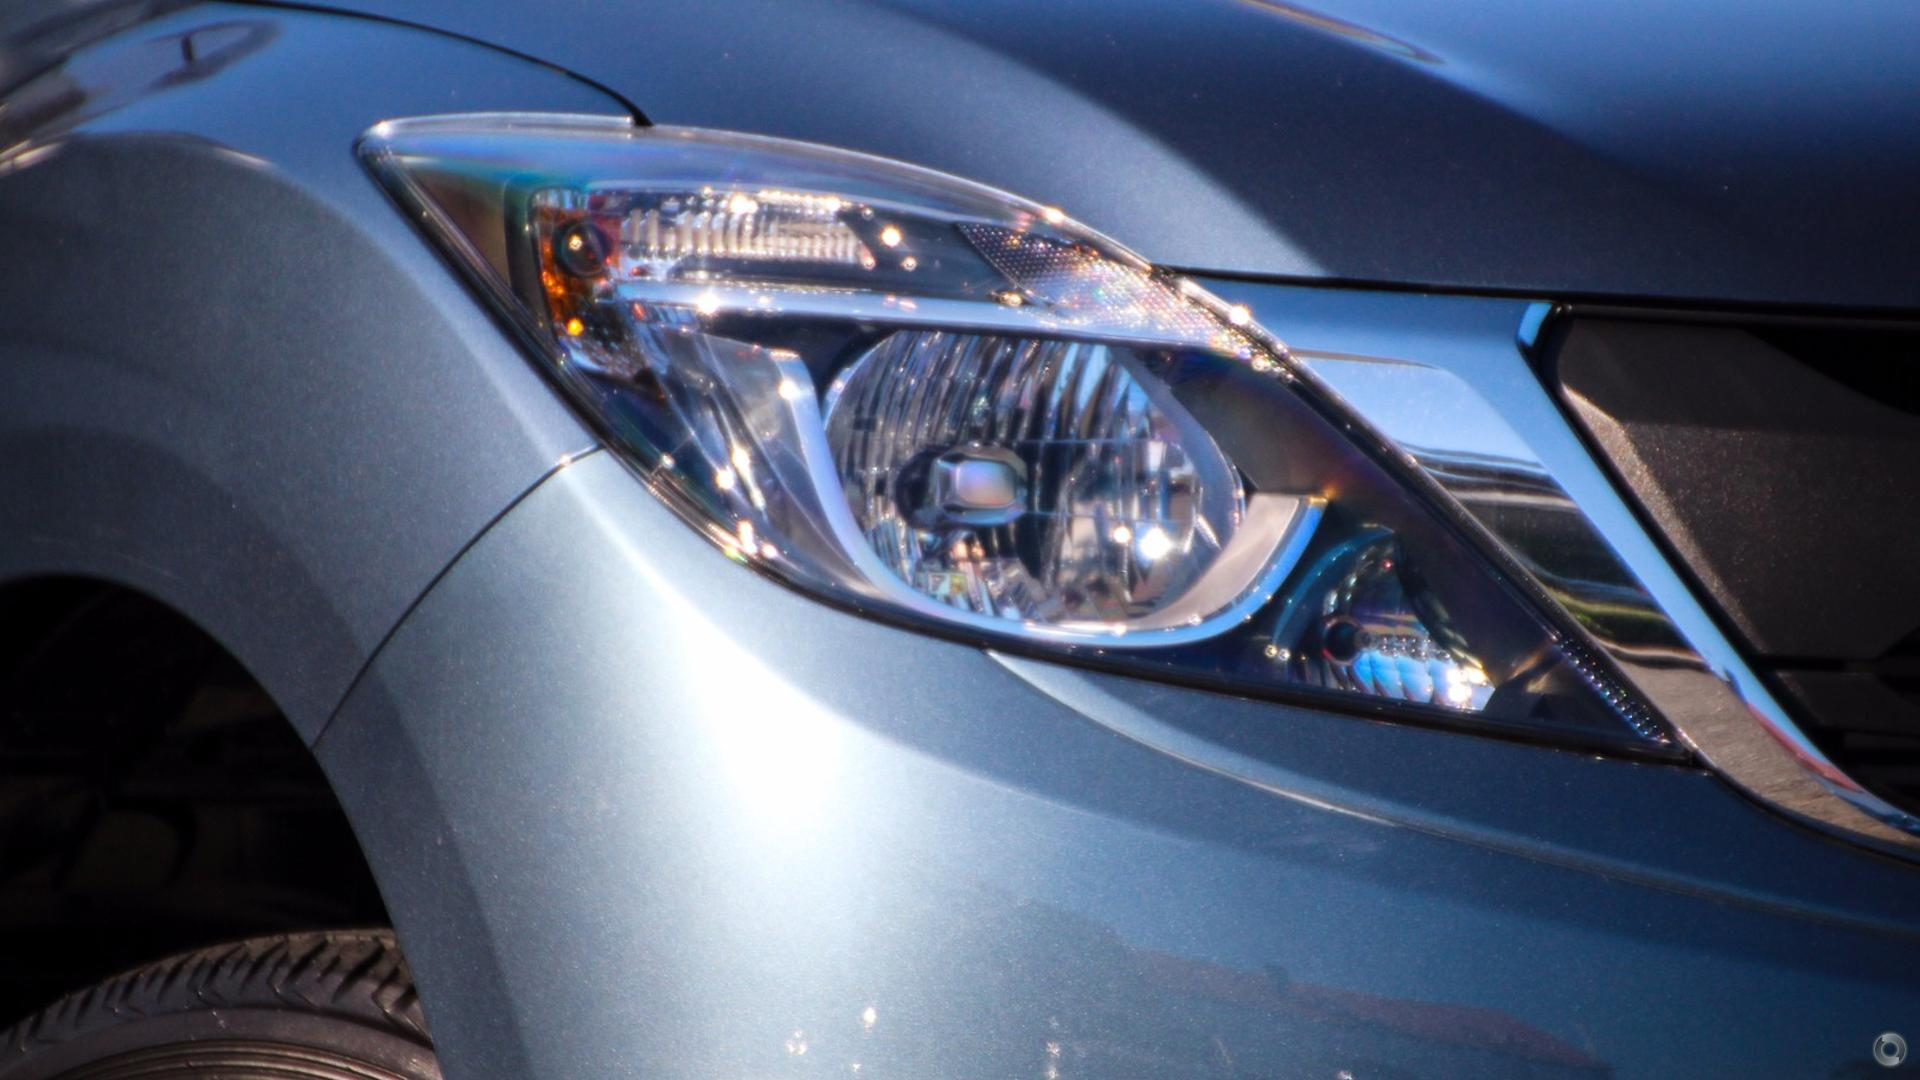 2017 Mazda Bt-50 Xt